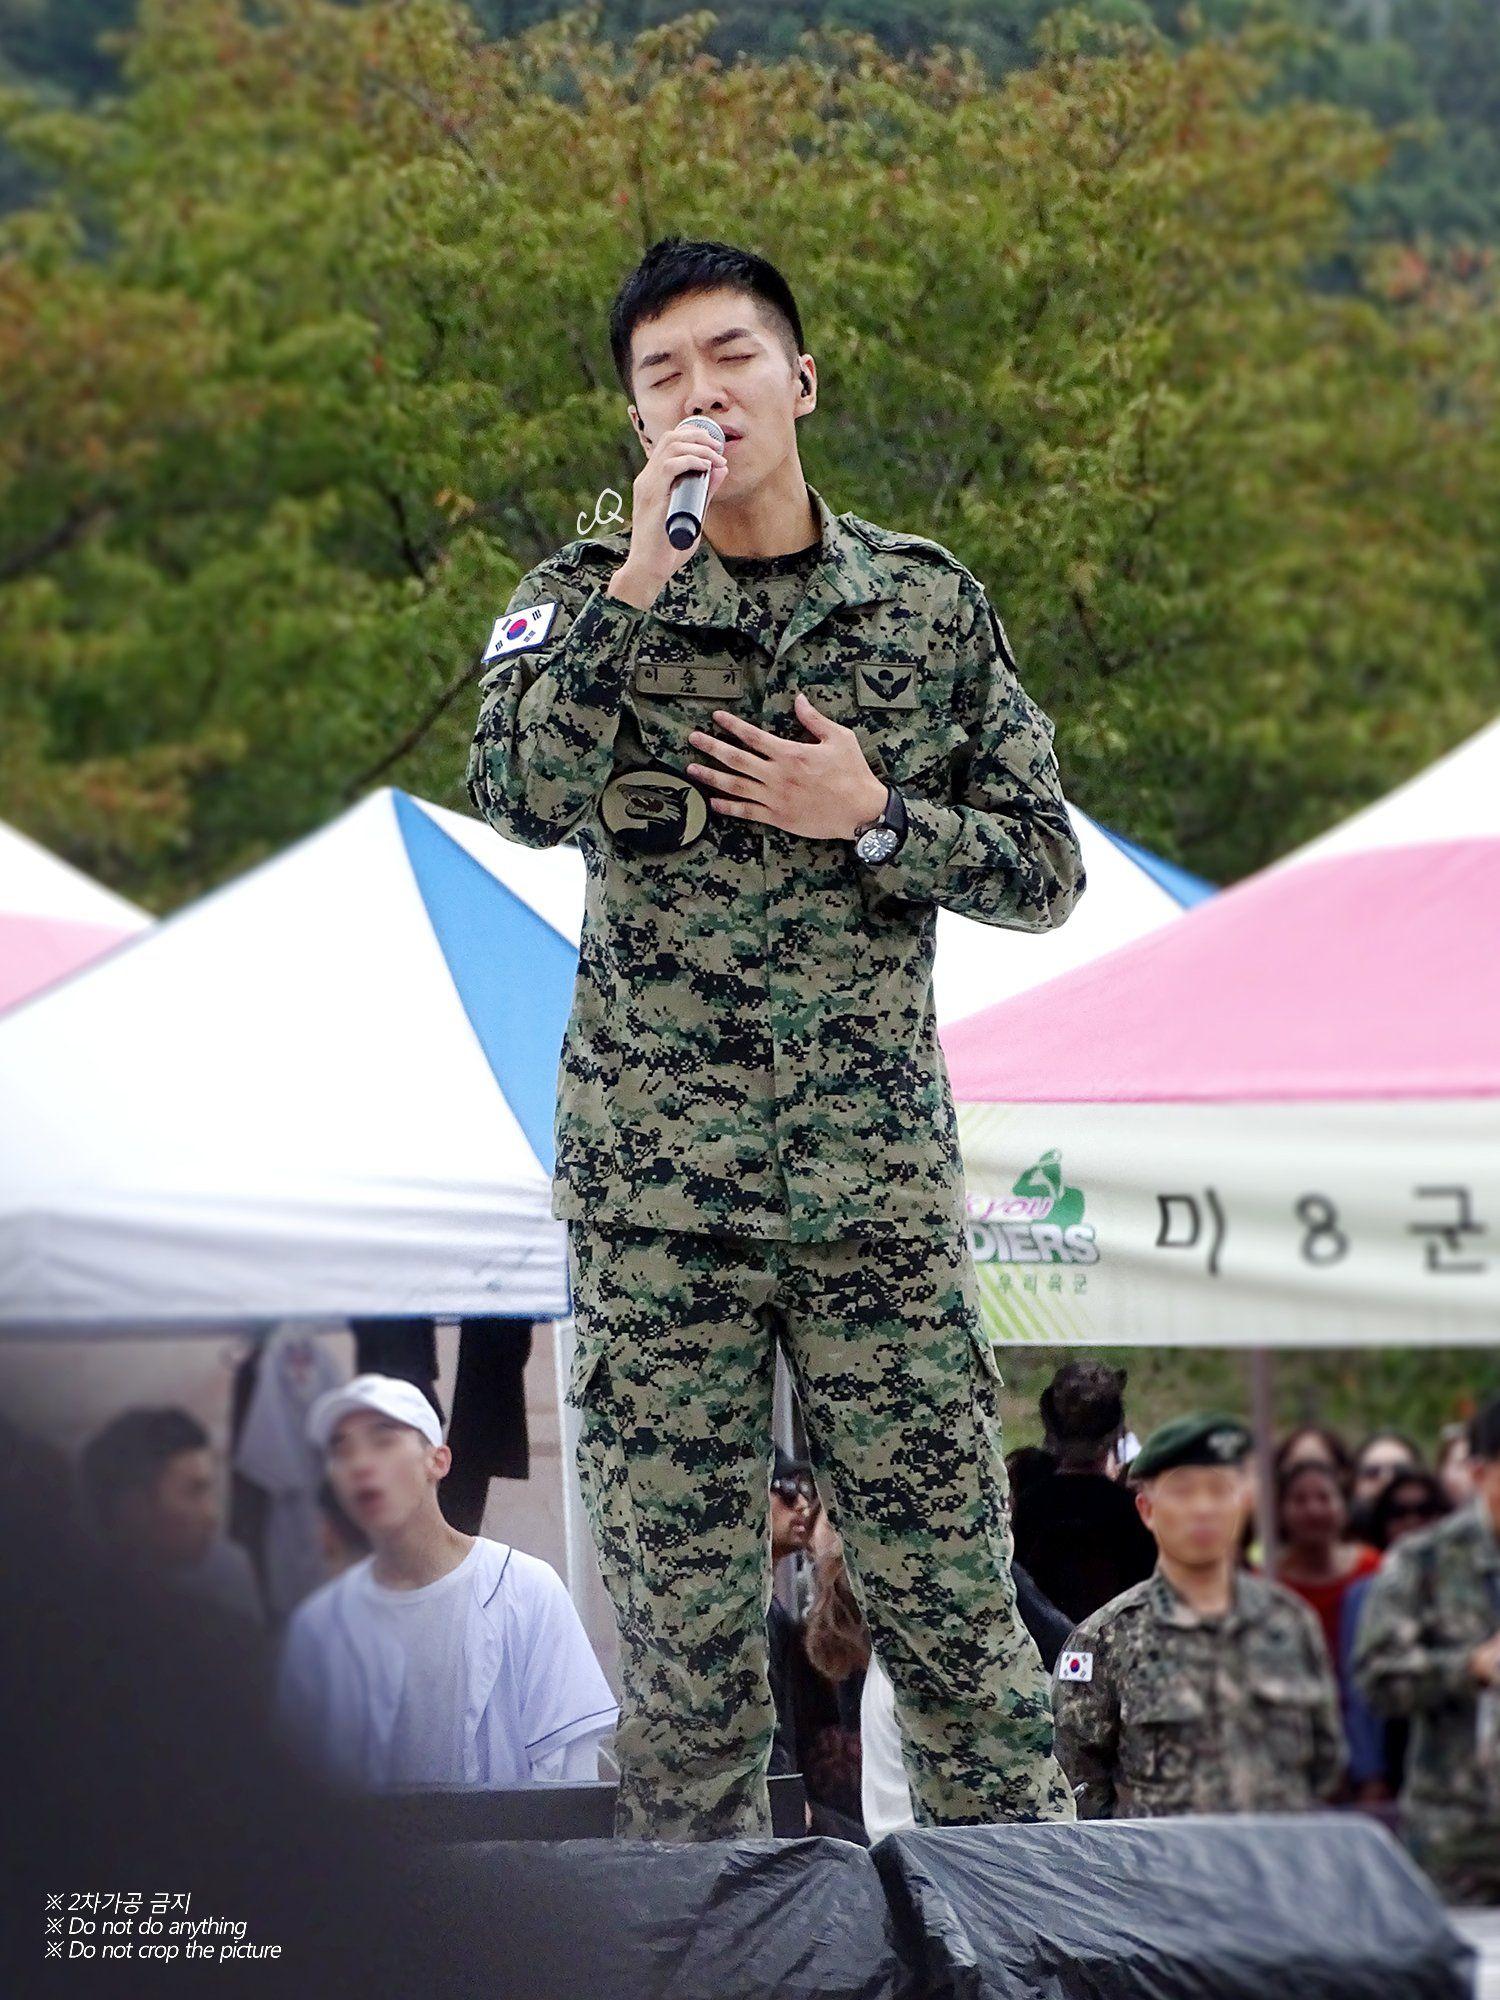 Korean Drama Hd Reddit - GaPhotoWorks - Free Photo and